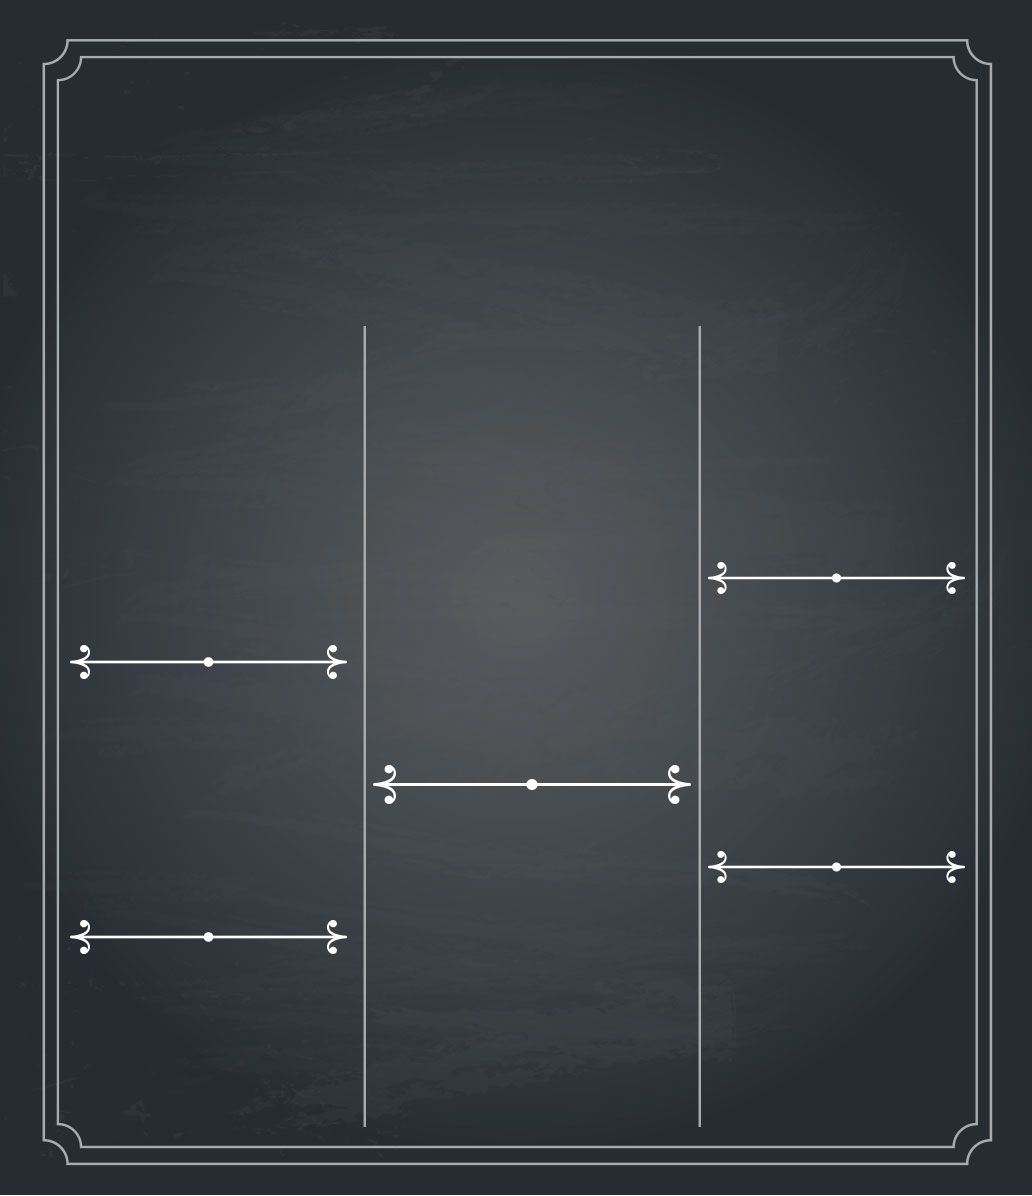 Chalkboard Molde Para Convite Quadro 3 Chalkboards